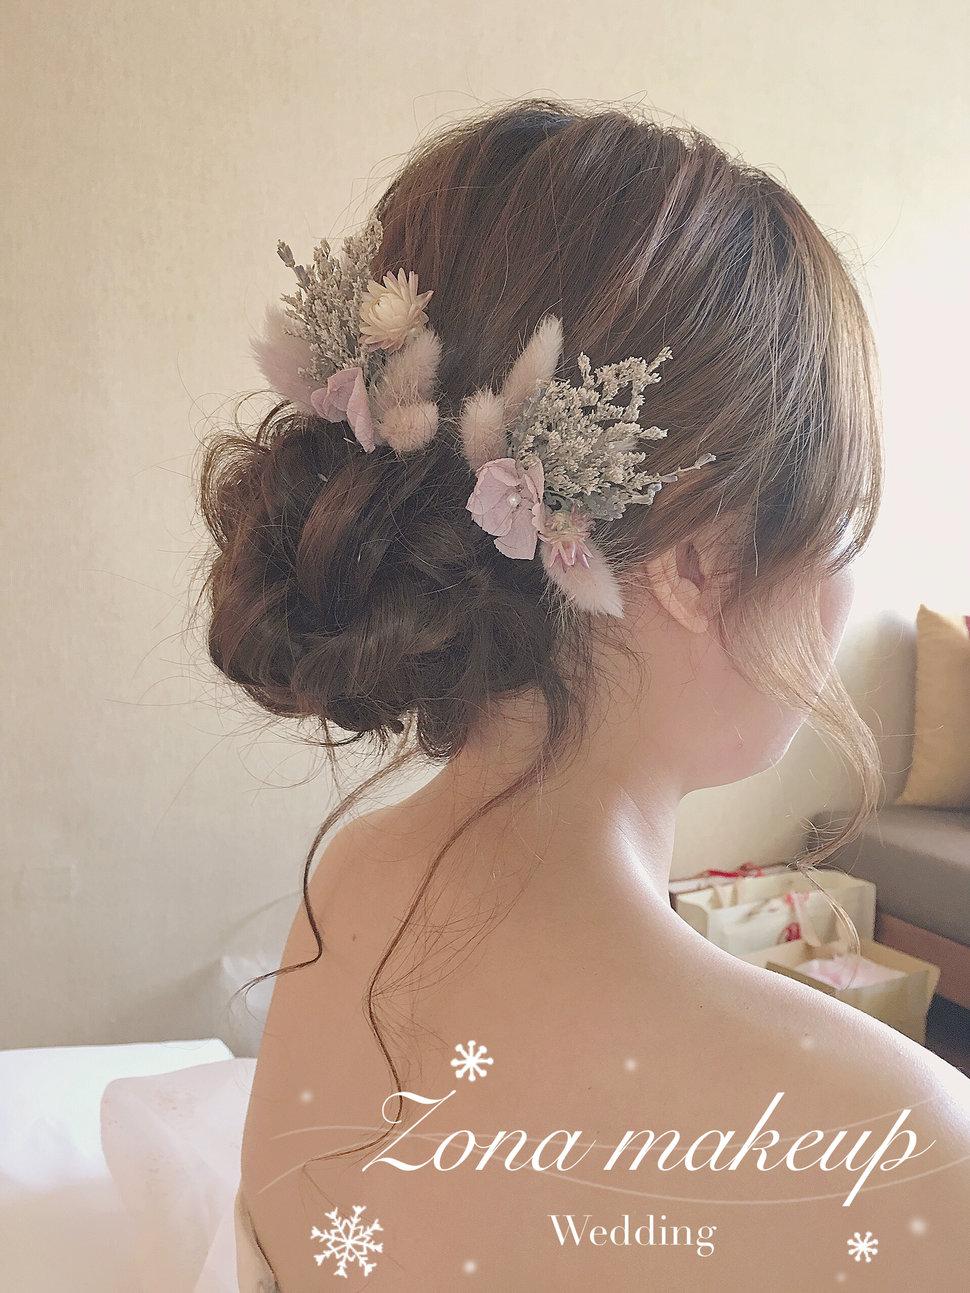 IMG_2862 - Zona時尚美甲x新娘秘書整體造型工作室《結婚吧》